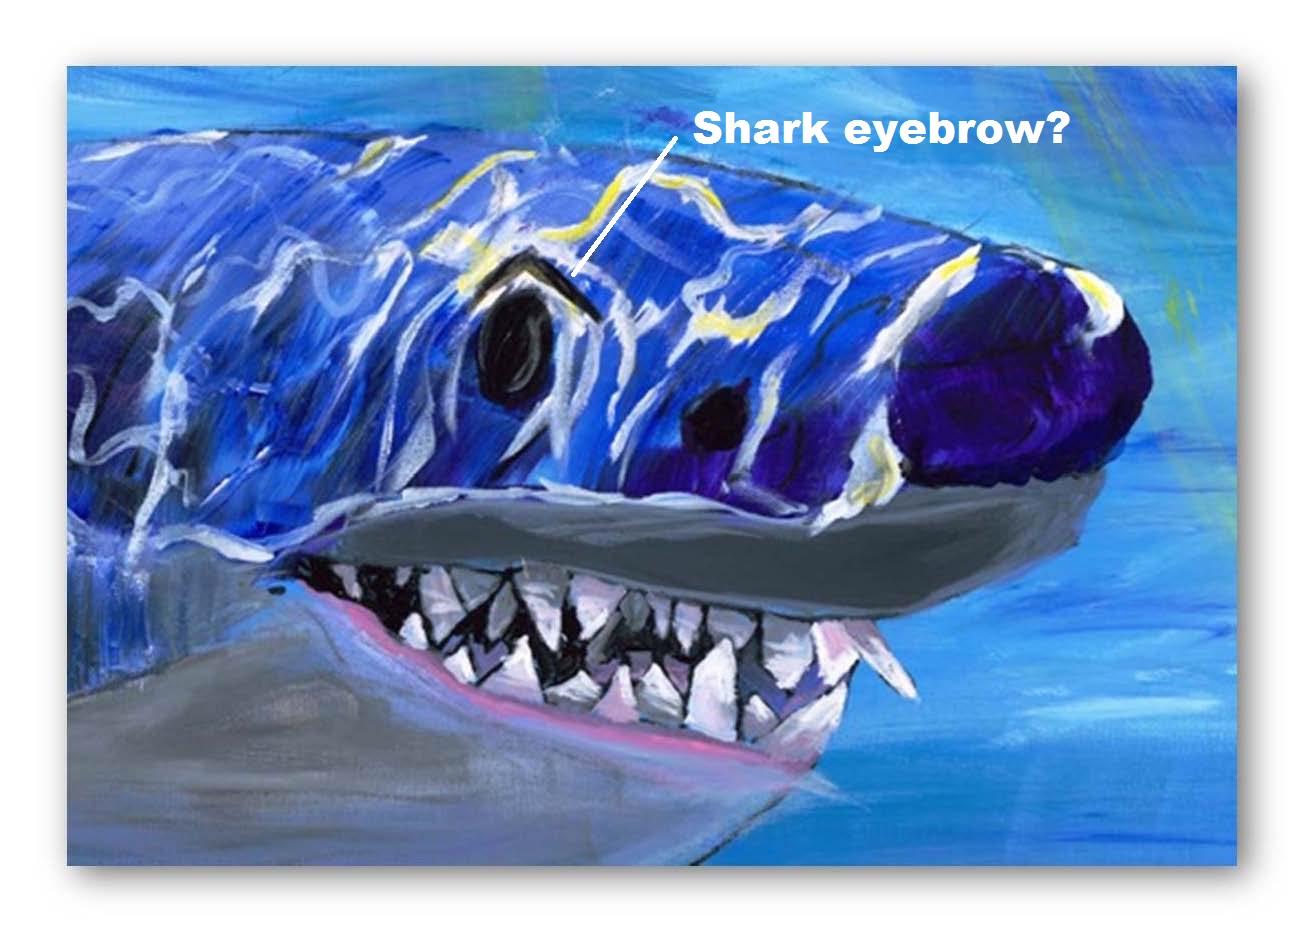 shark eyebrows.jpg